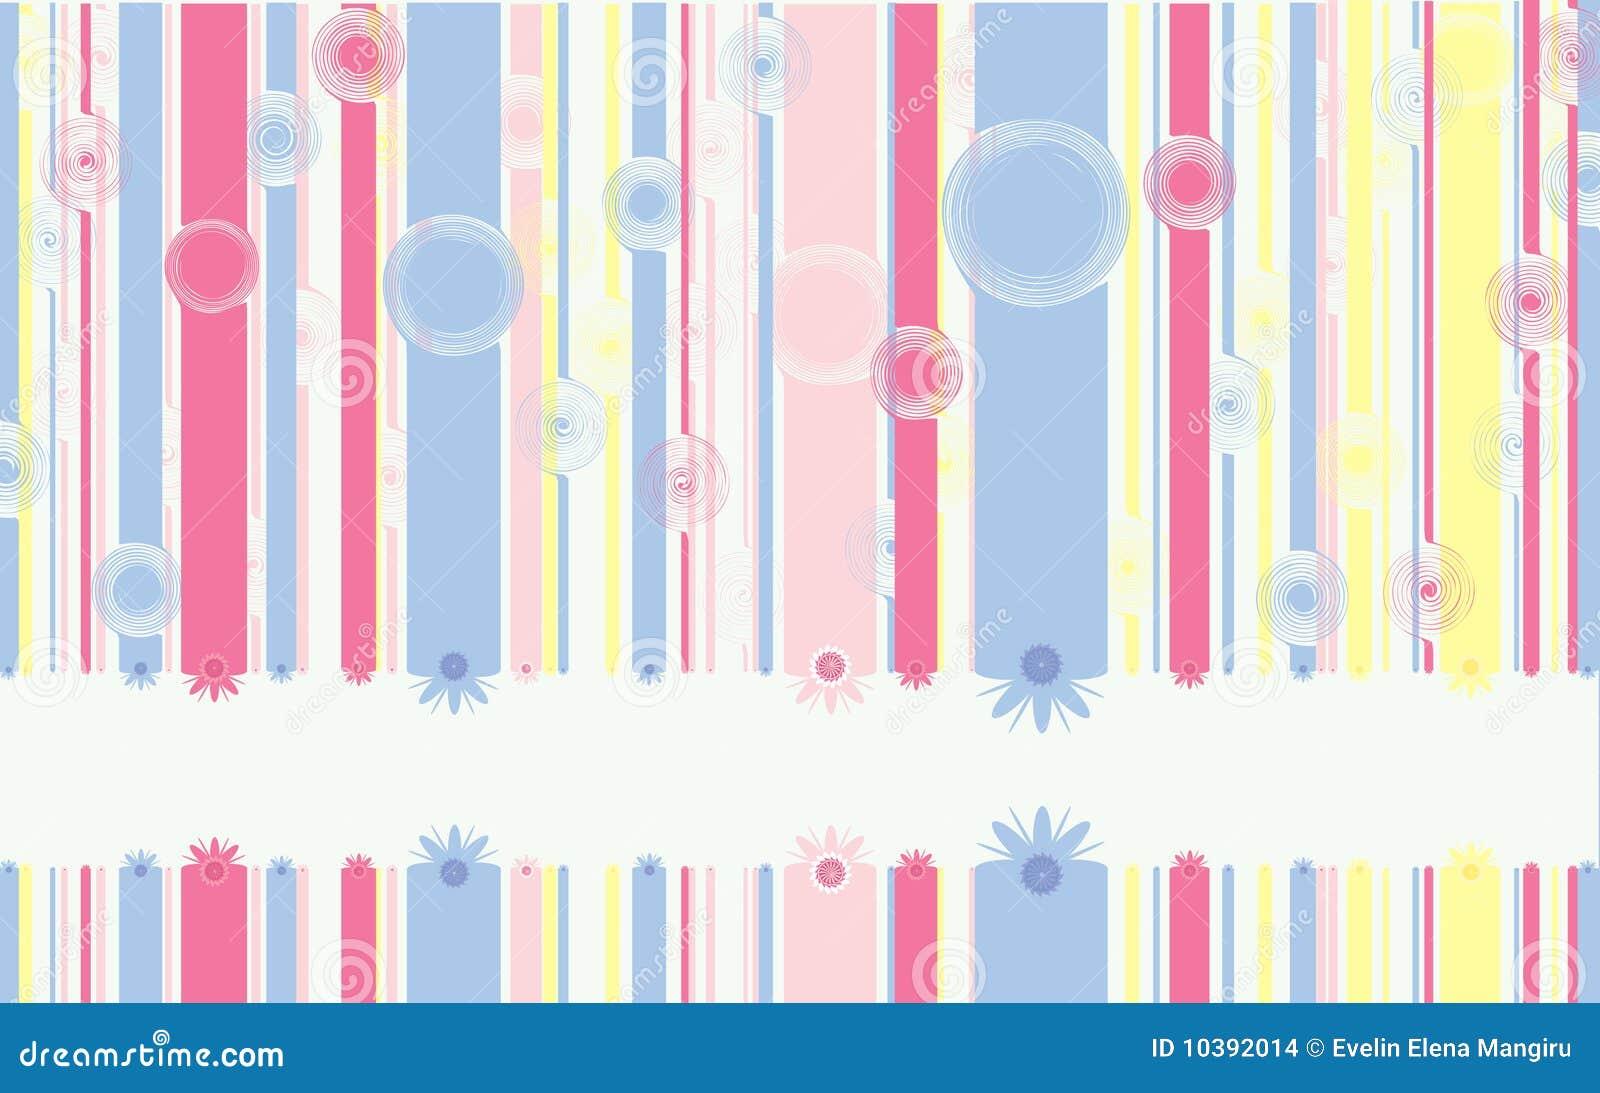 Sweet Vertical Lines Stock Illustration. Illustration Of